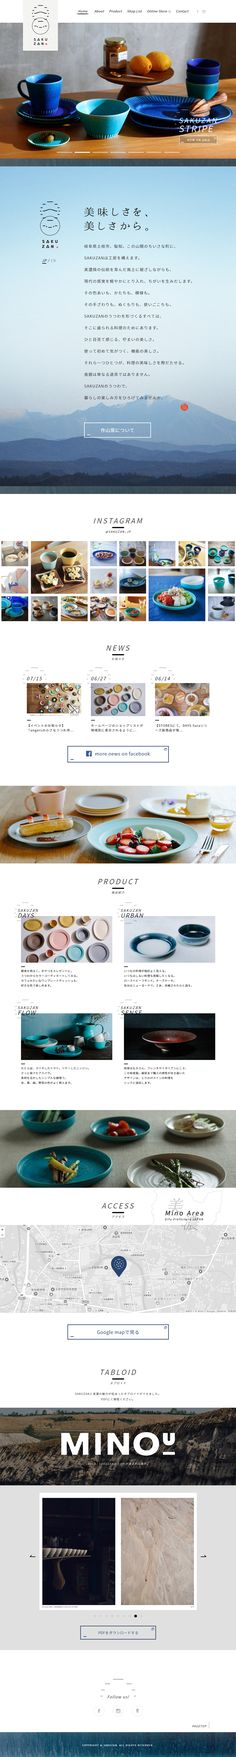 SAKUZAN|WEBデザイナーさん必見!ランディングページのデザイン参考に(シンプル系)